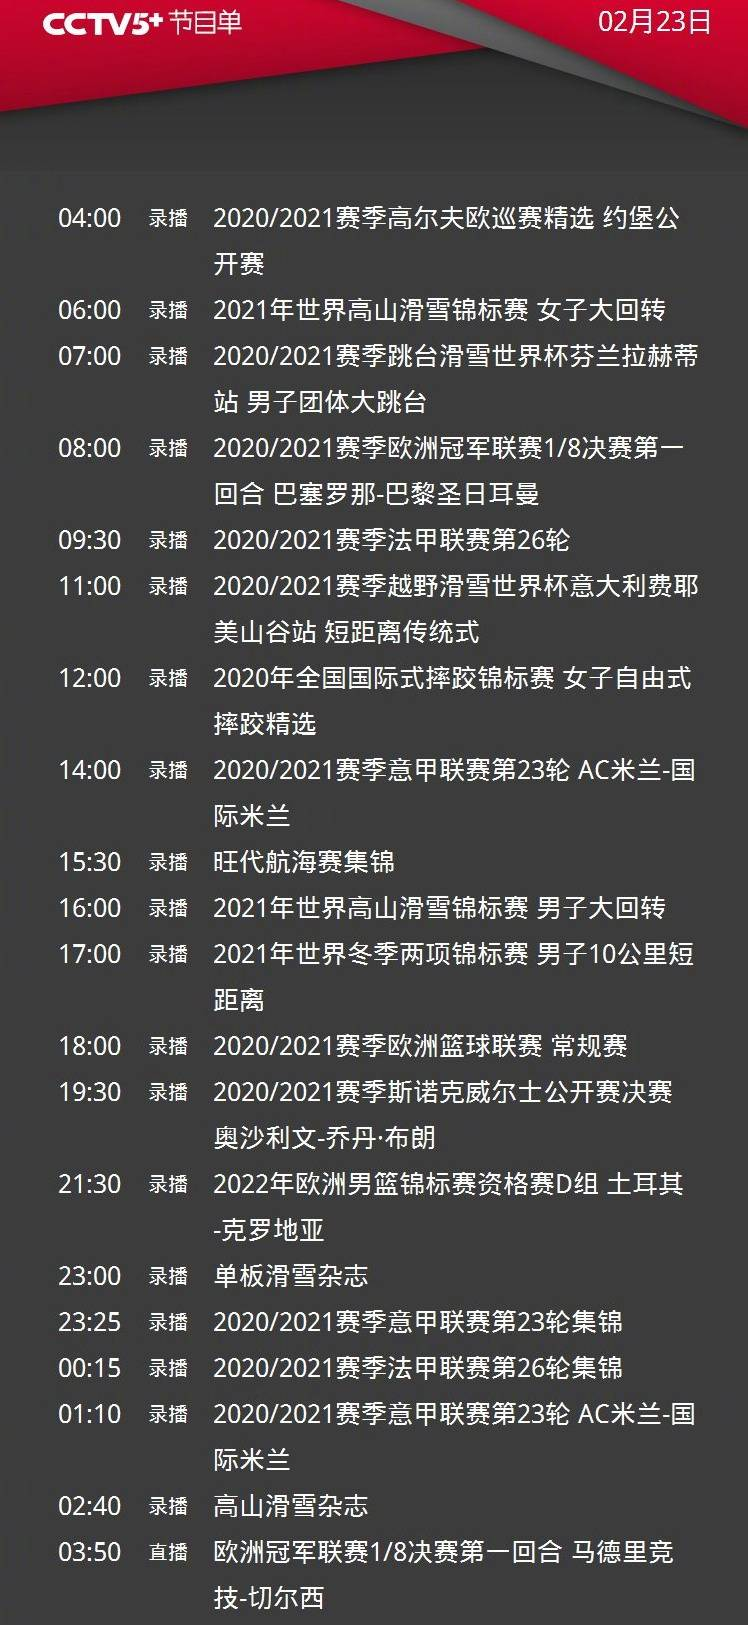 CCTV5直播欧冠拜仁PK拉齐奥,APP欧洲男篮锦标赛,5+马竞vs切尔西